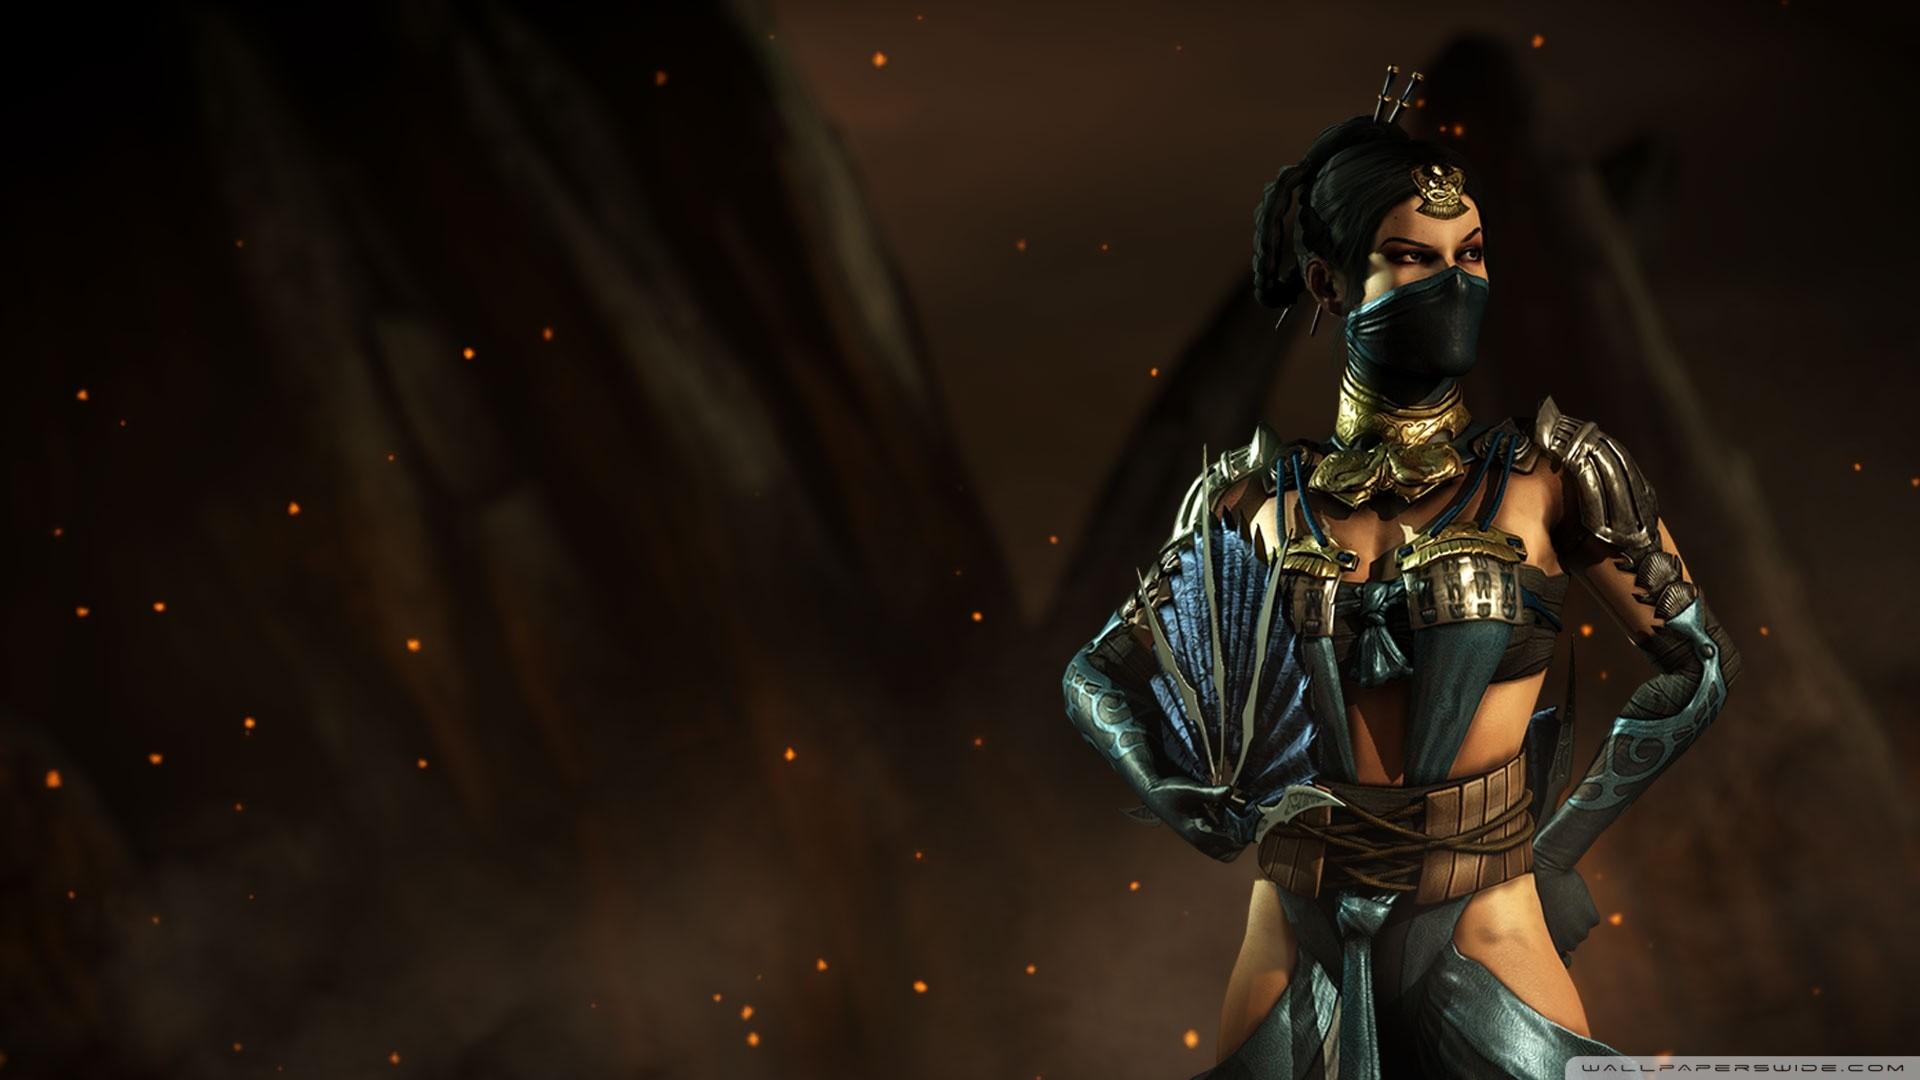 1920x1080 Mortal Kombat X Sub Zero 4K 5K Wallpapers